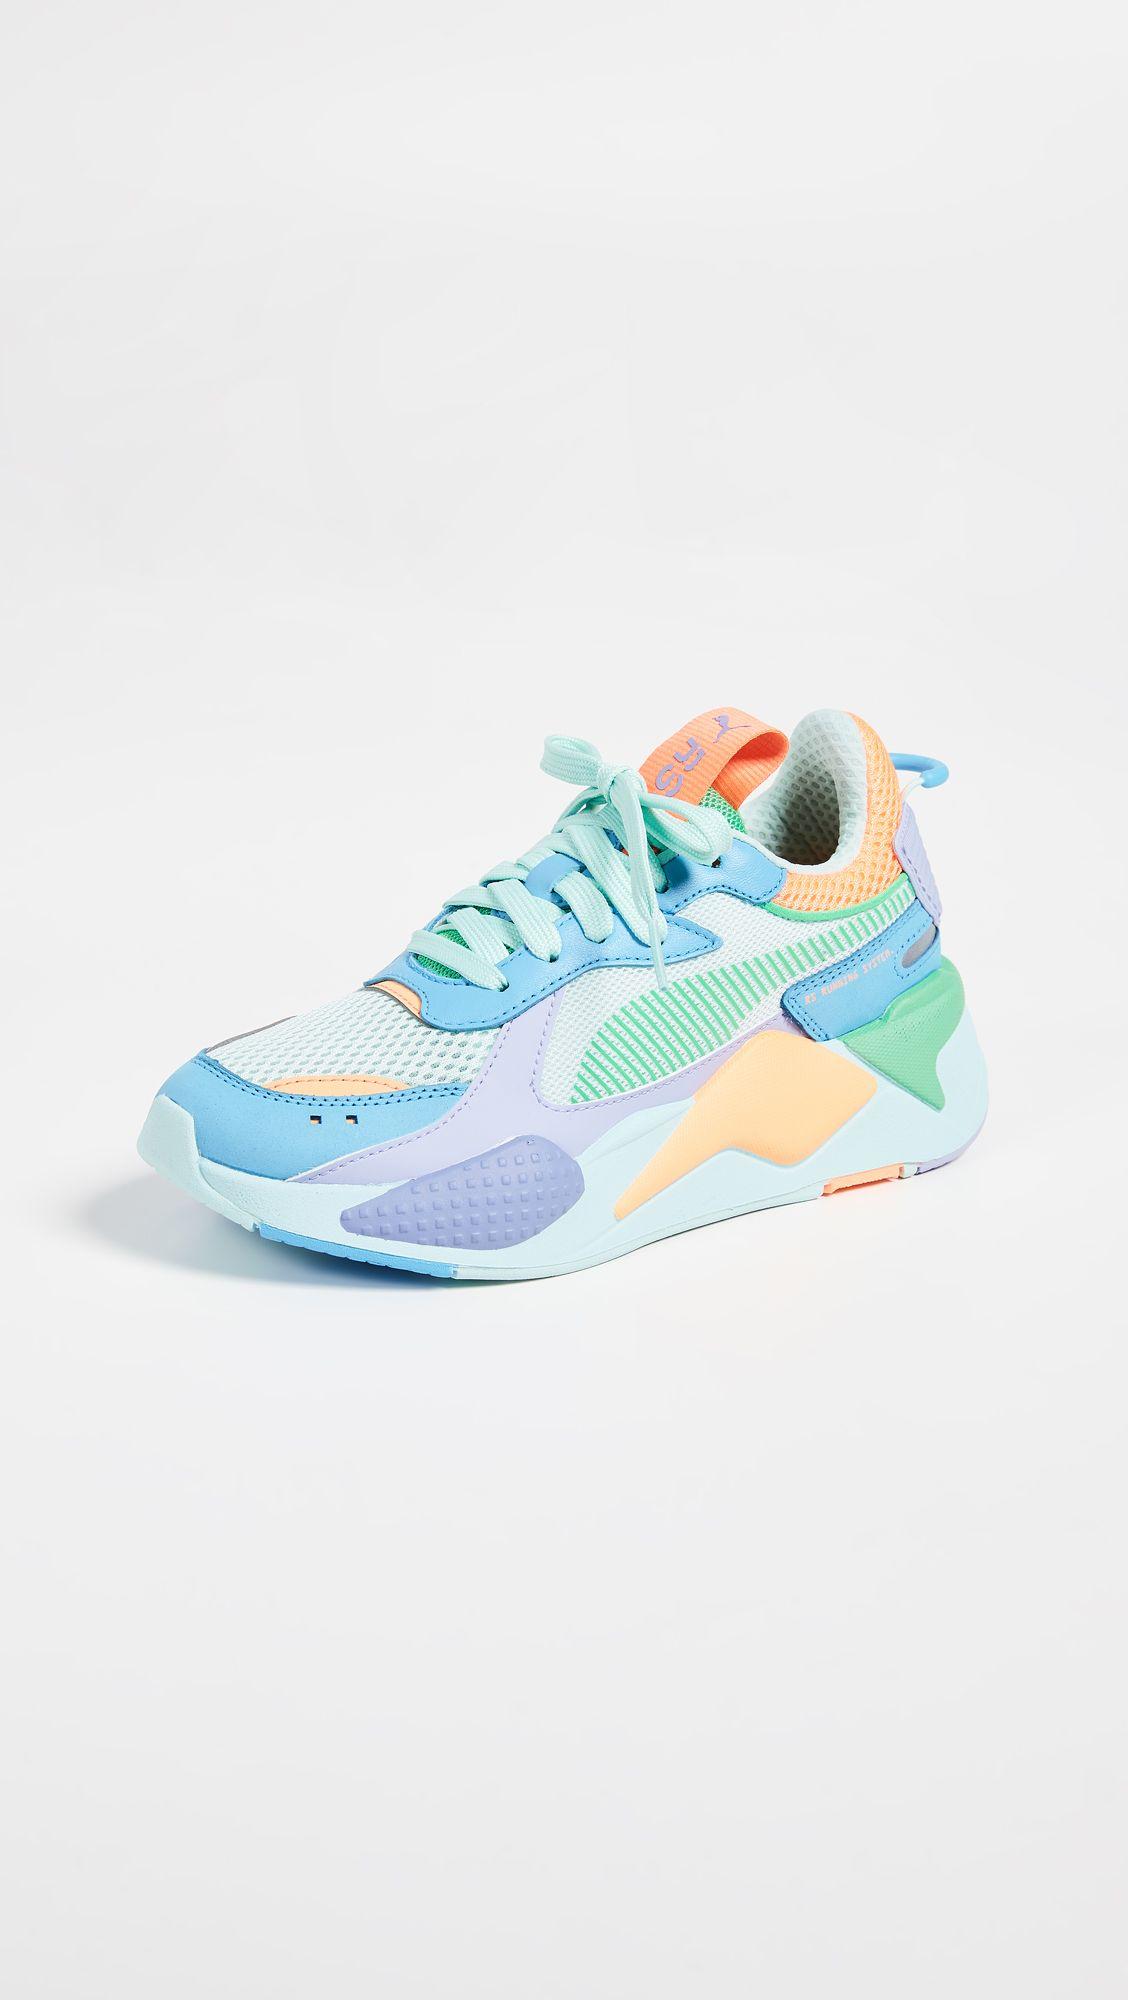 PUMA RS-X Colorblock Sneakers | SHOPBOP